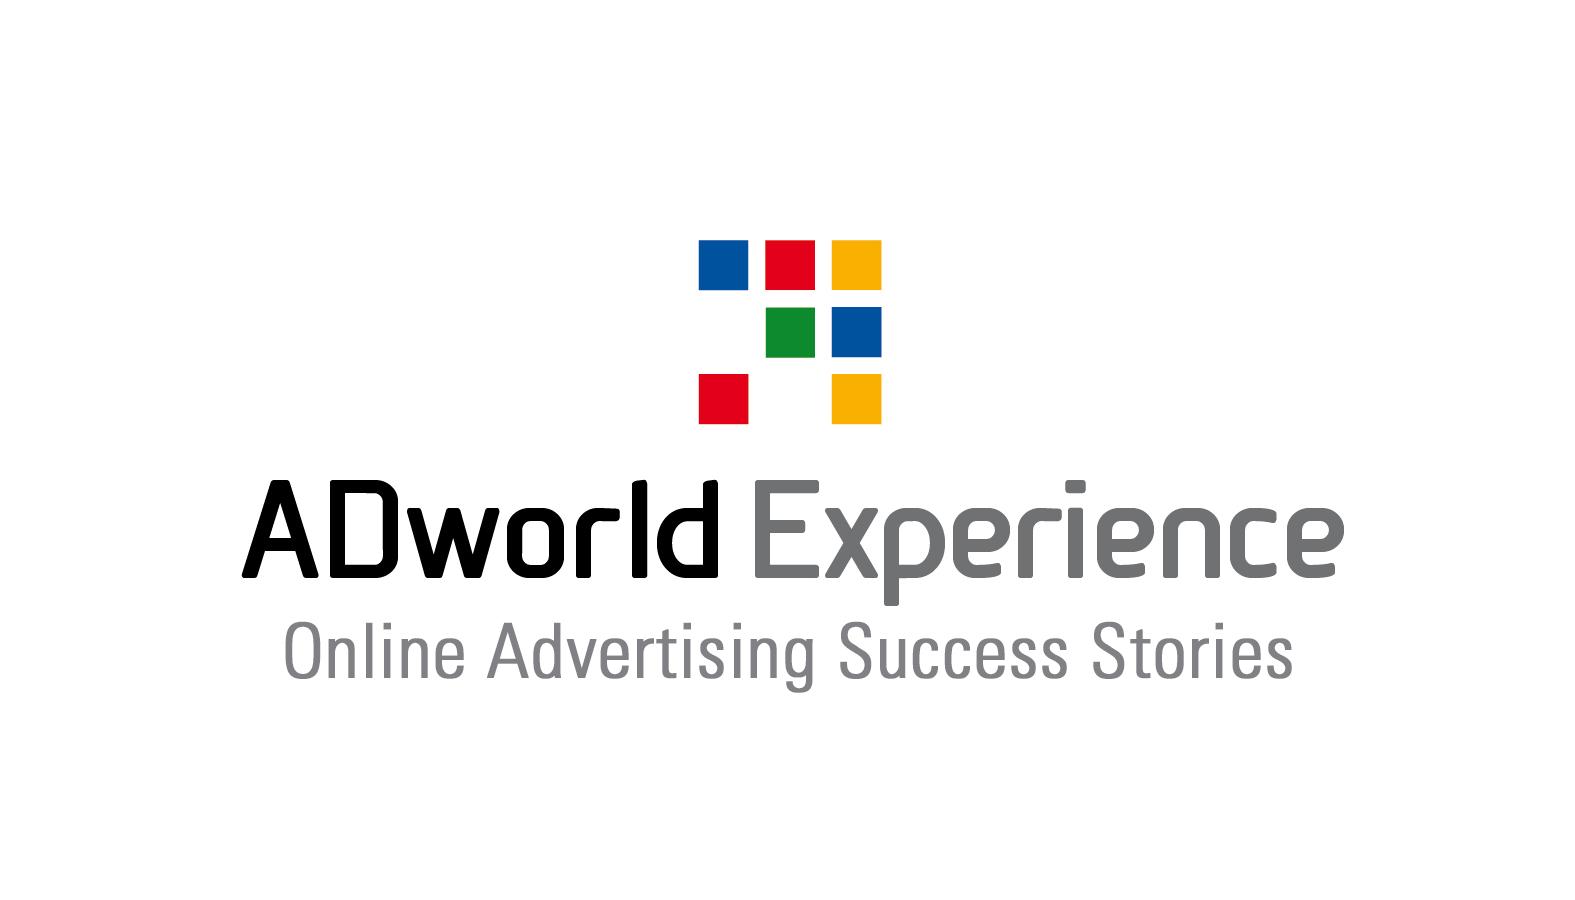 Adworld Experience